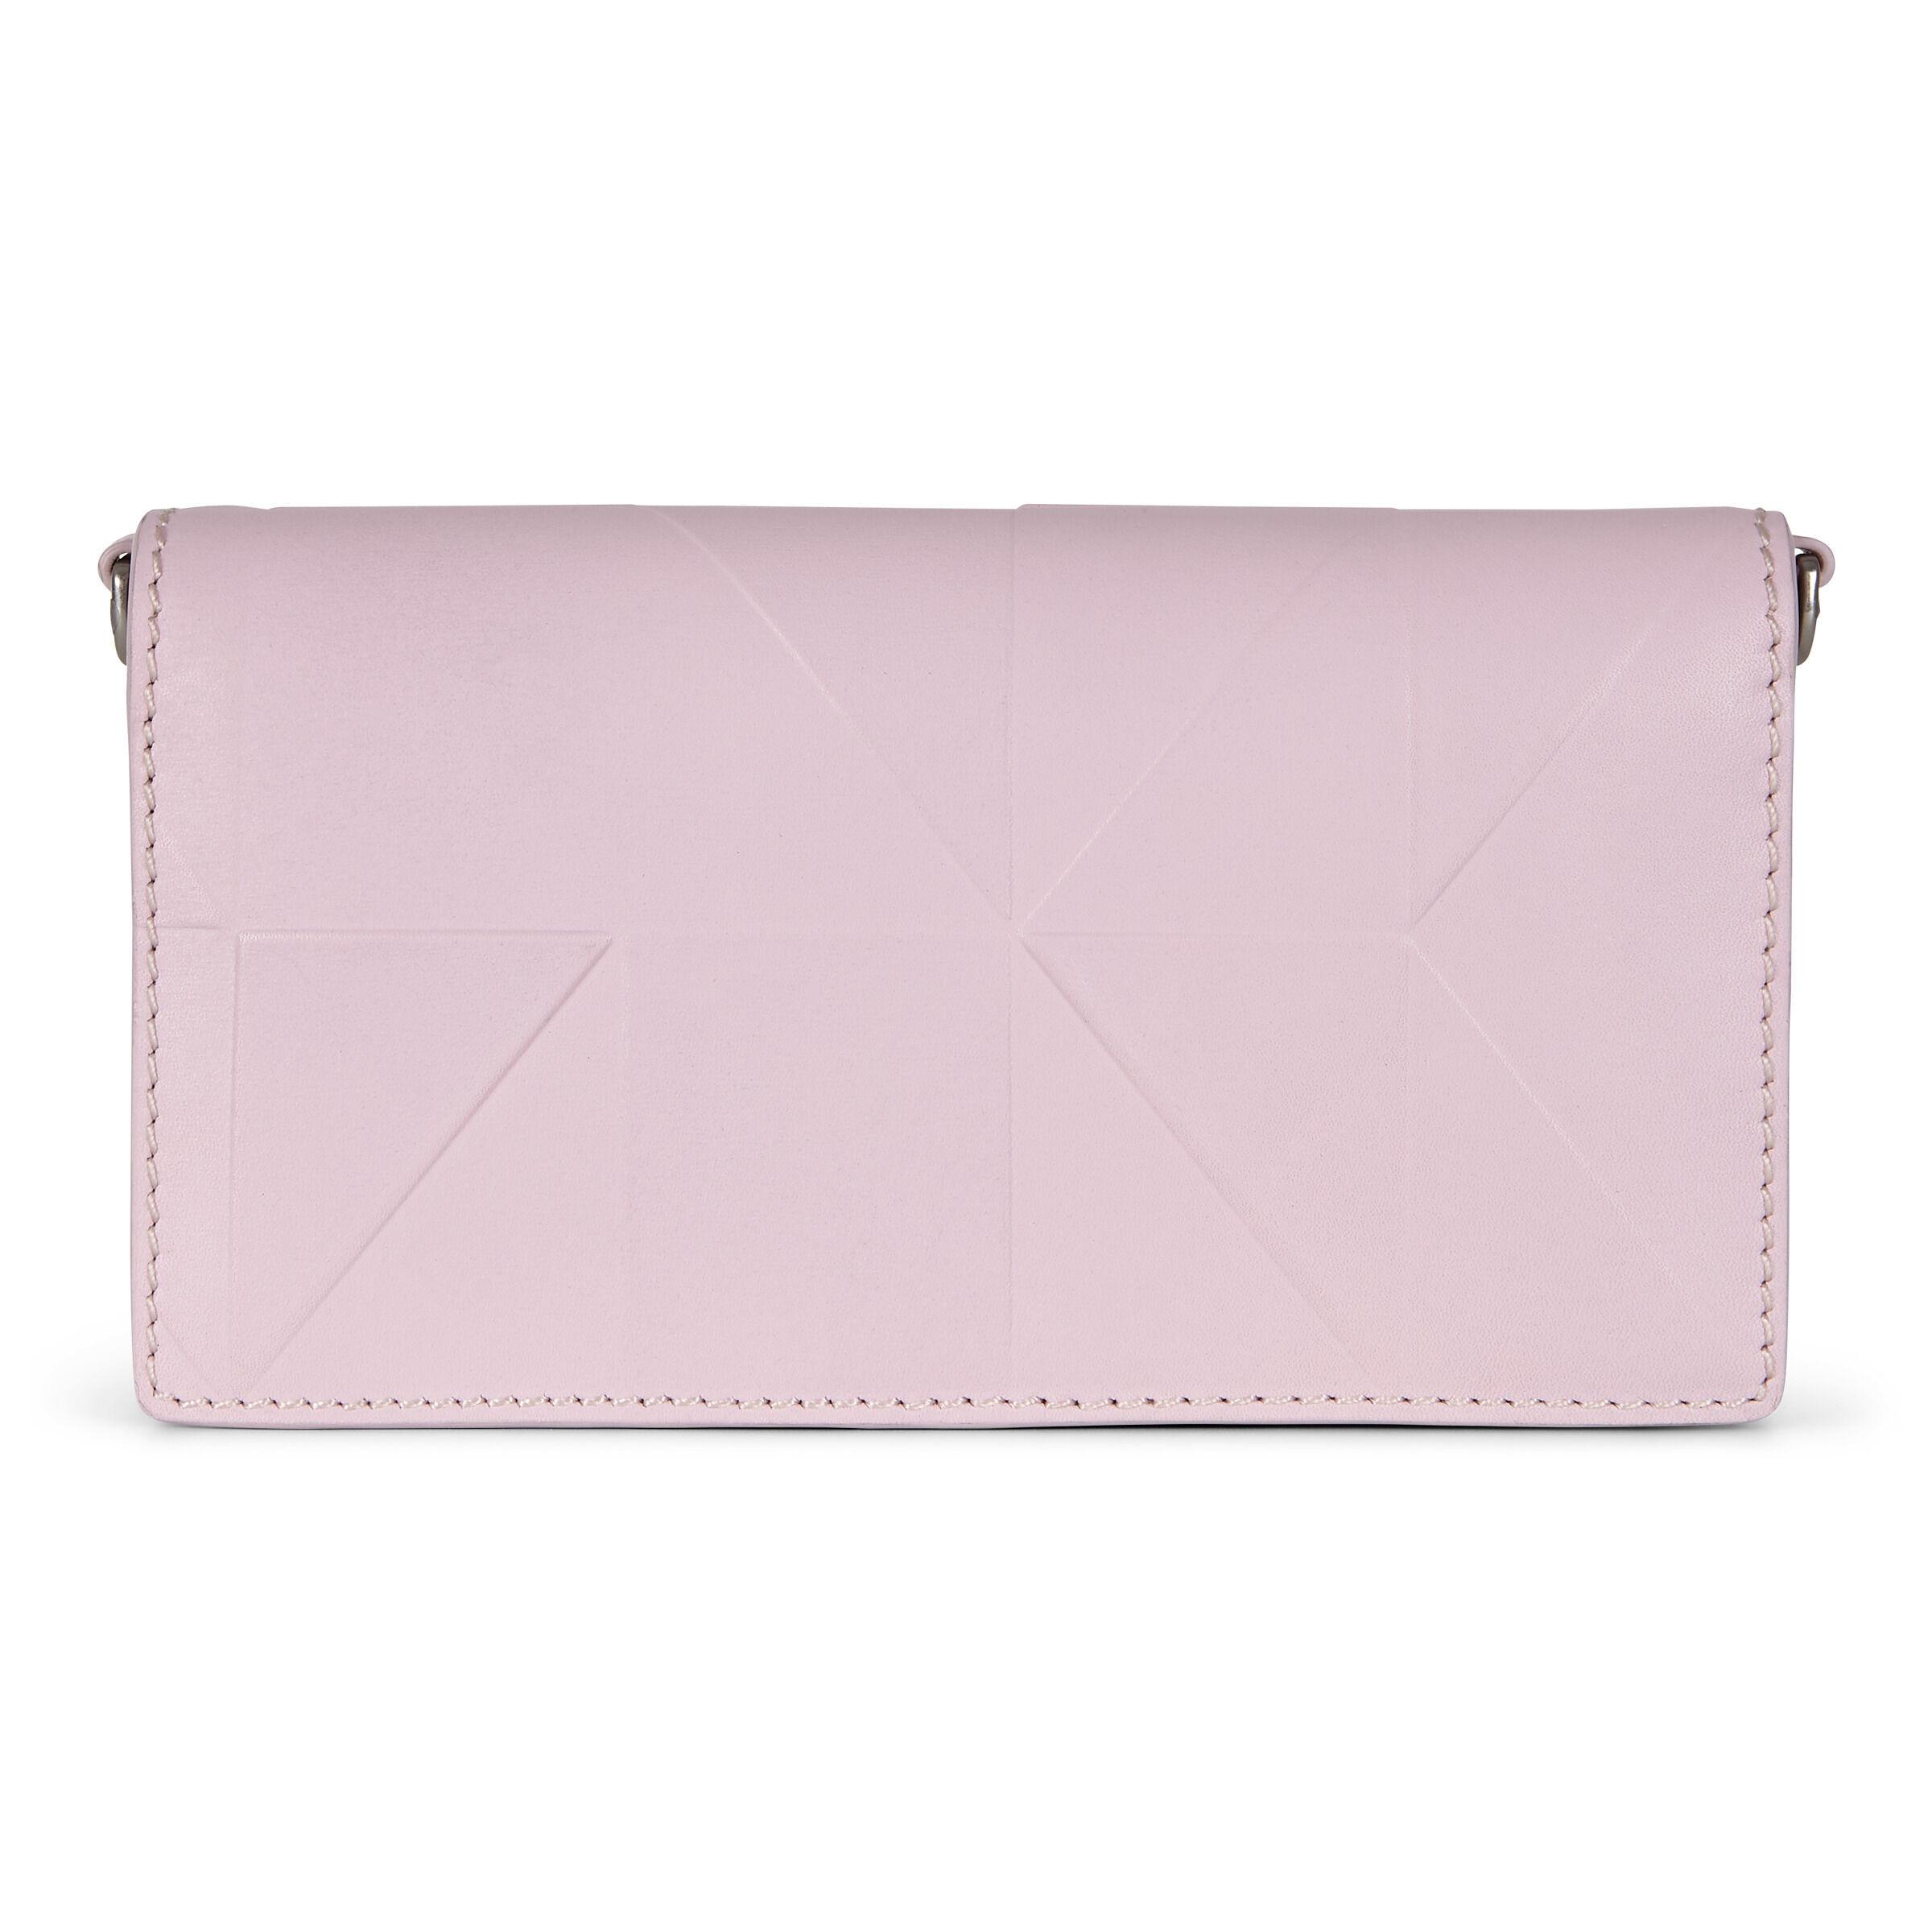 ECCO Geometrik Crossbody Wallet: One Size - Blossom Rose